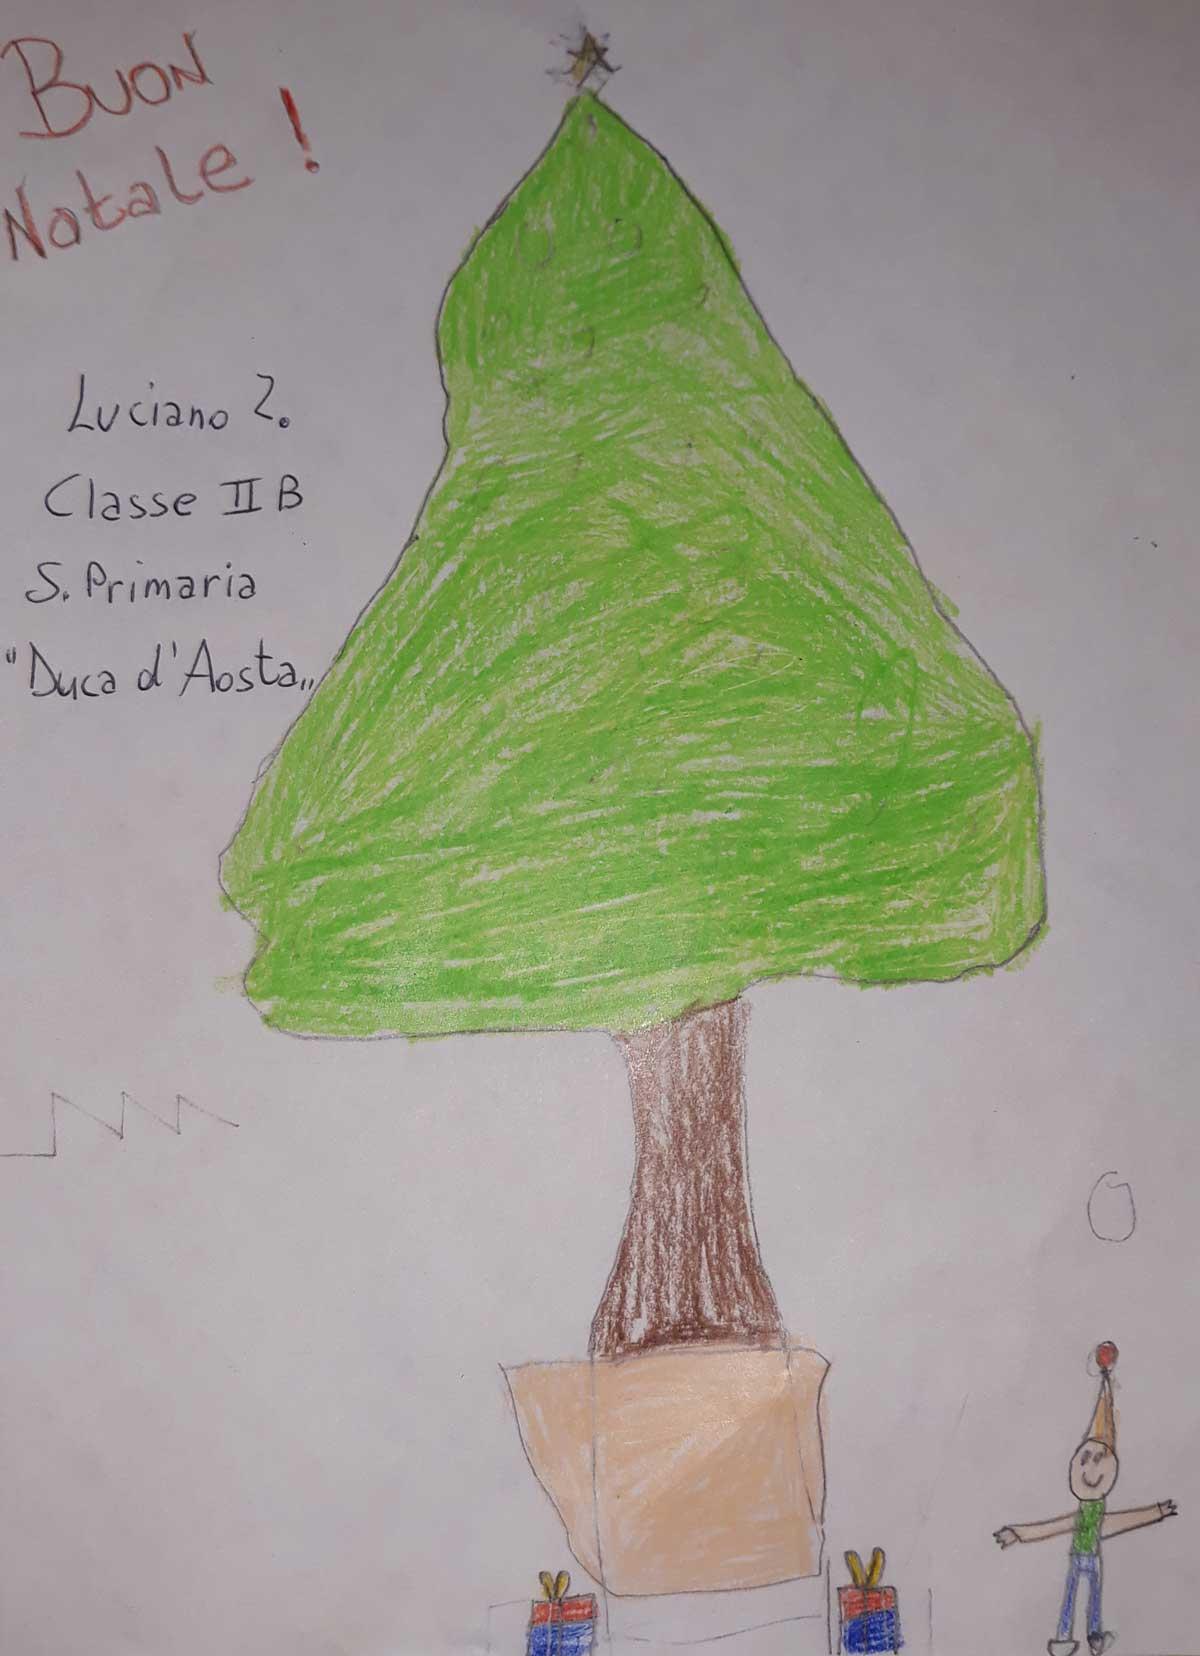 54.-L'-AMORE-a-Natale-allontana-ogni-male!_Luciano